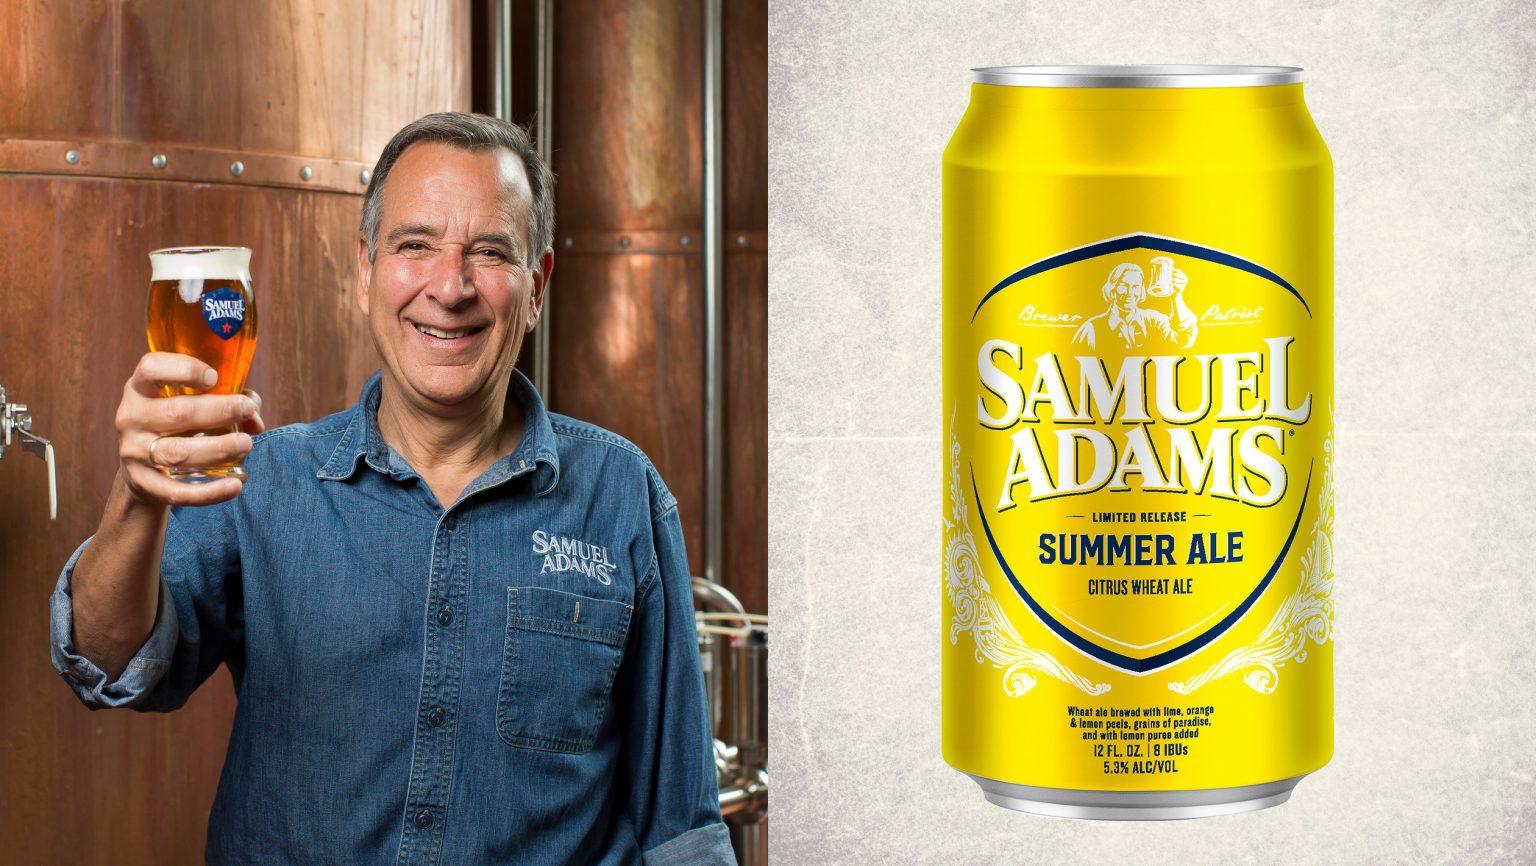 Photos: Courtesy of Boston Beer